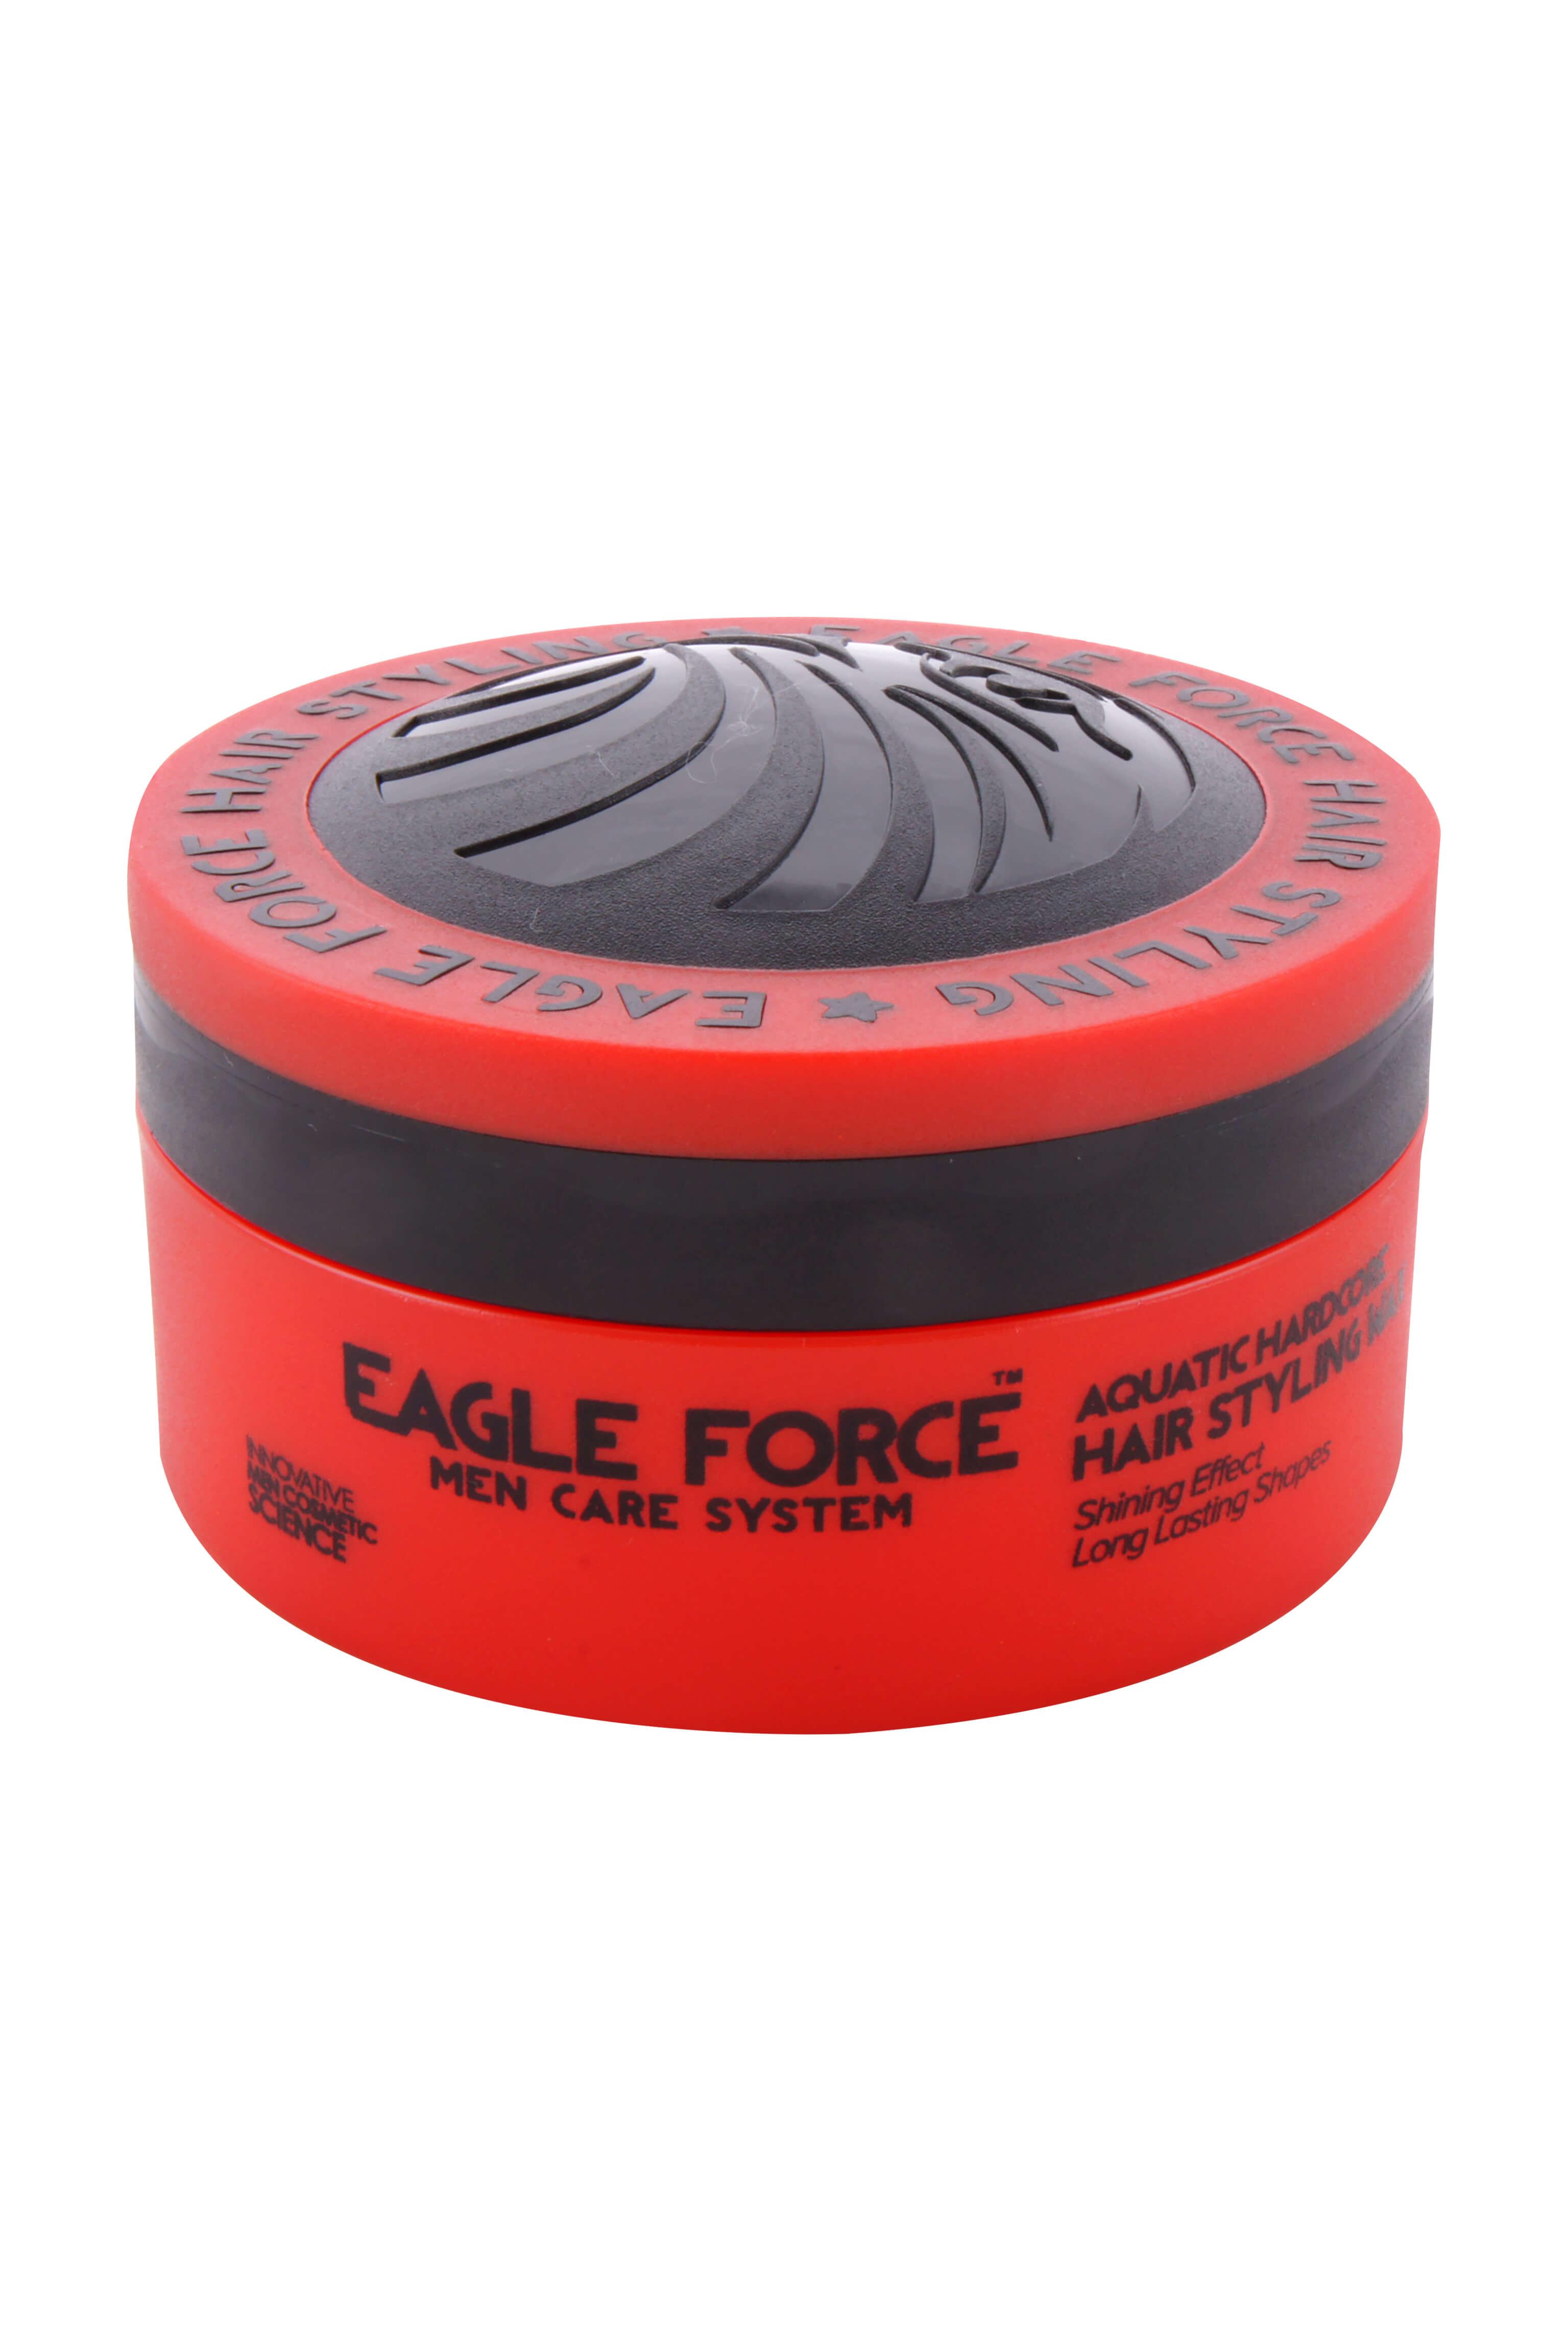 Eagle Force Hair Styling Wax Aquatic Hardcore, 150 ml